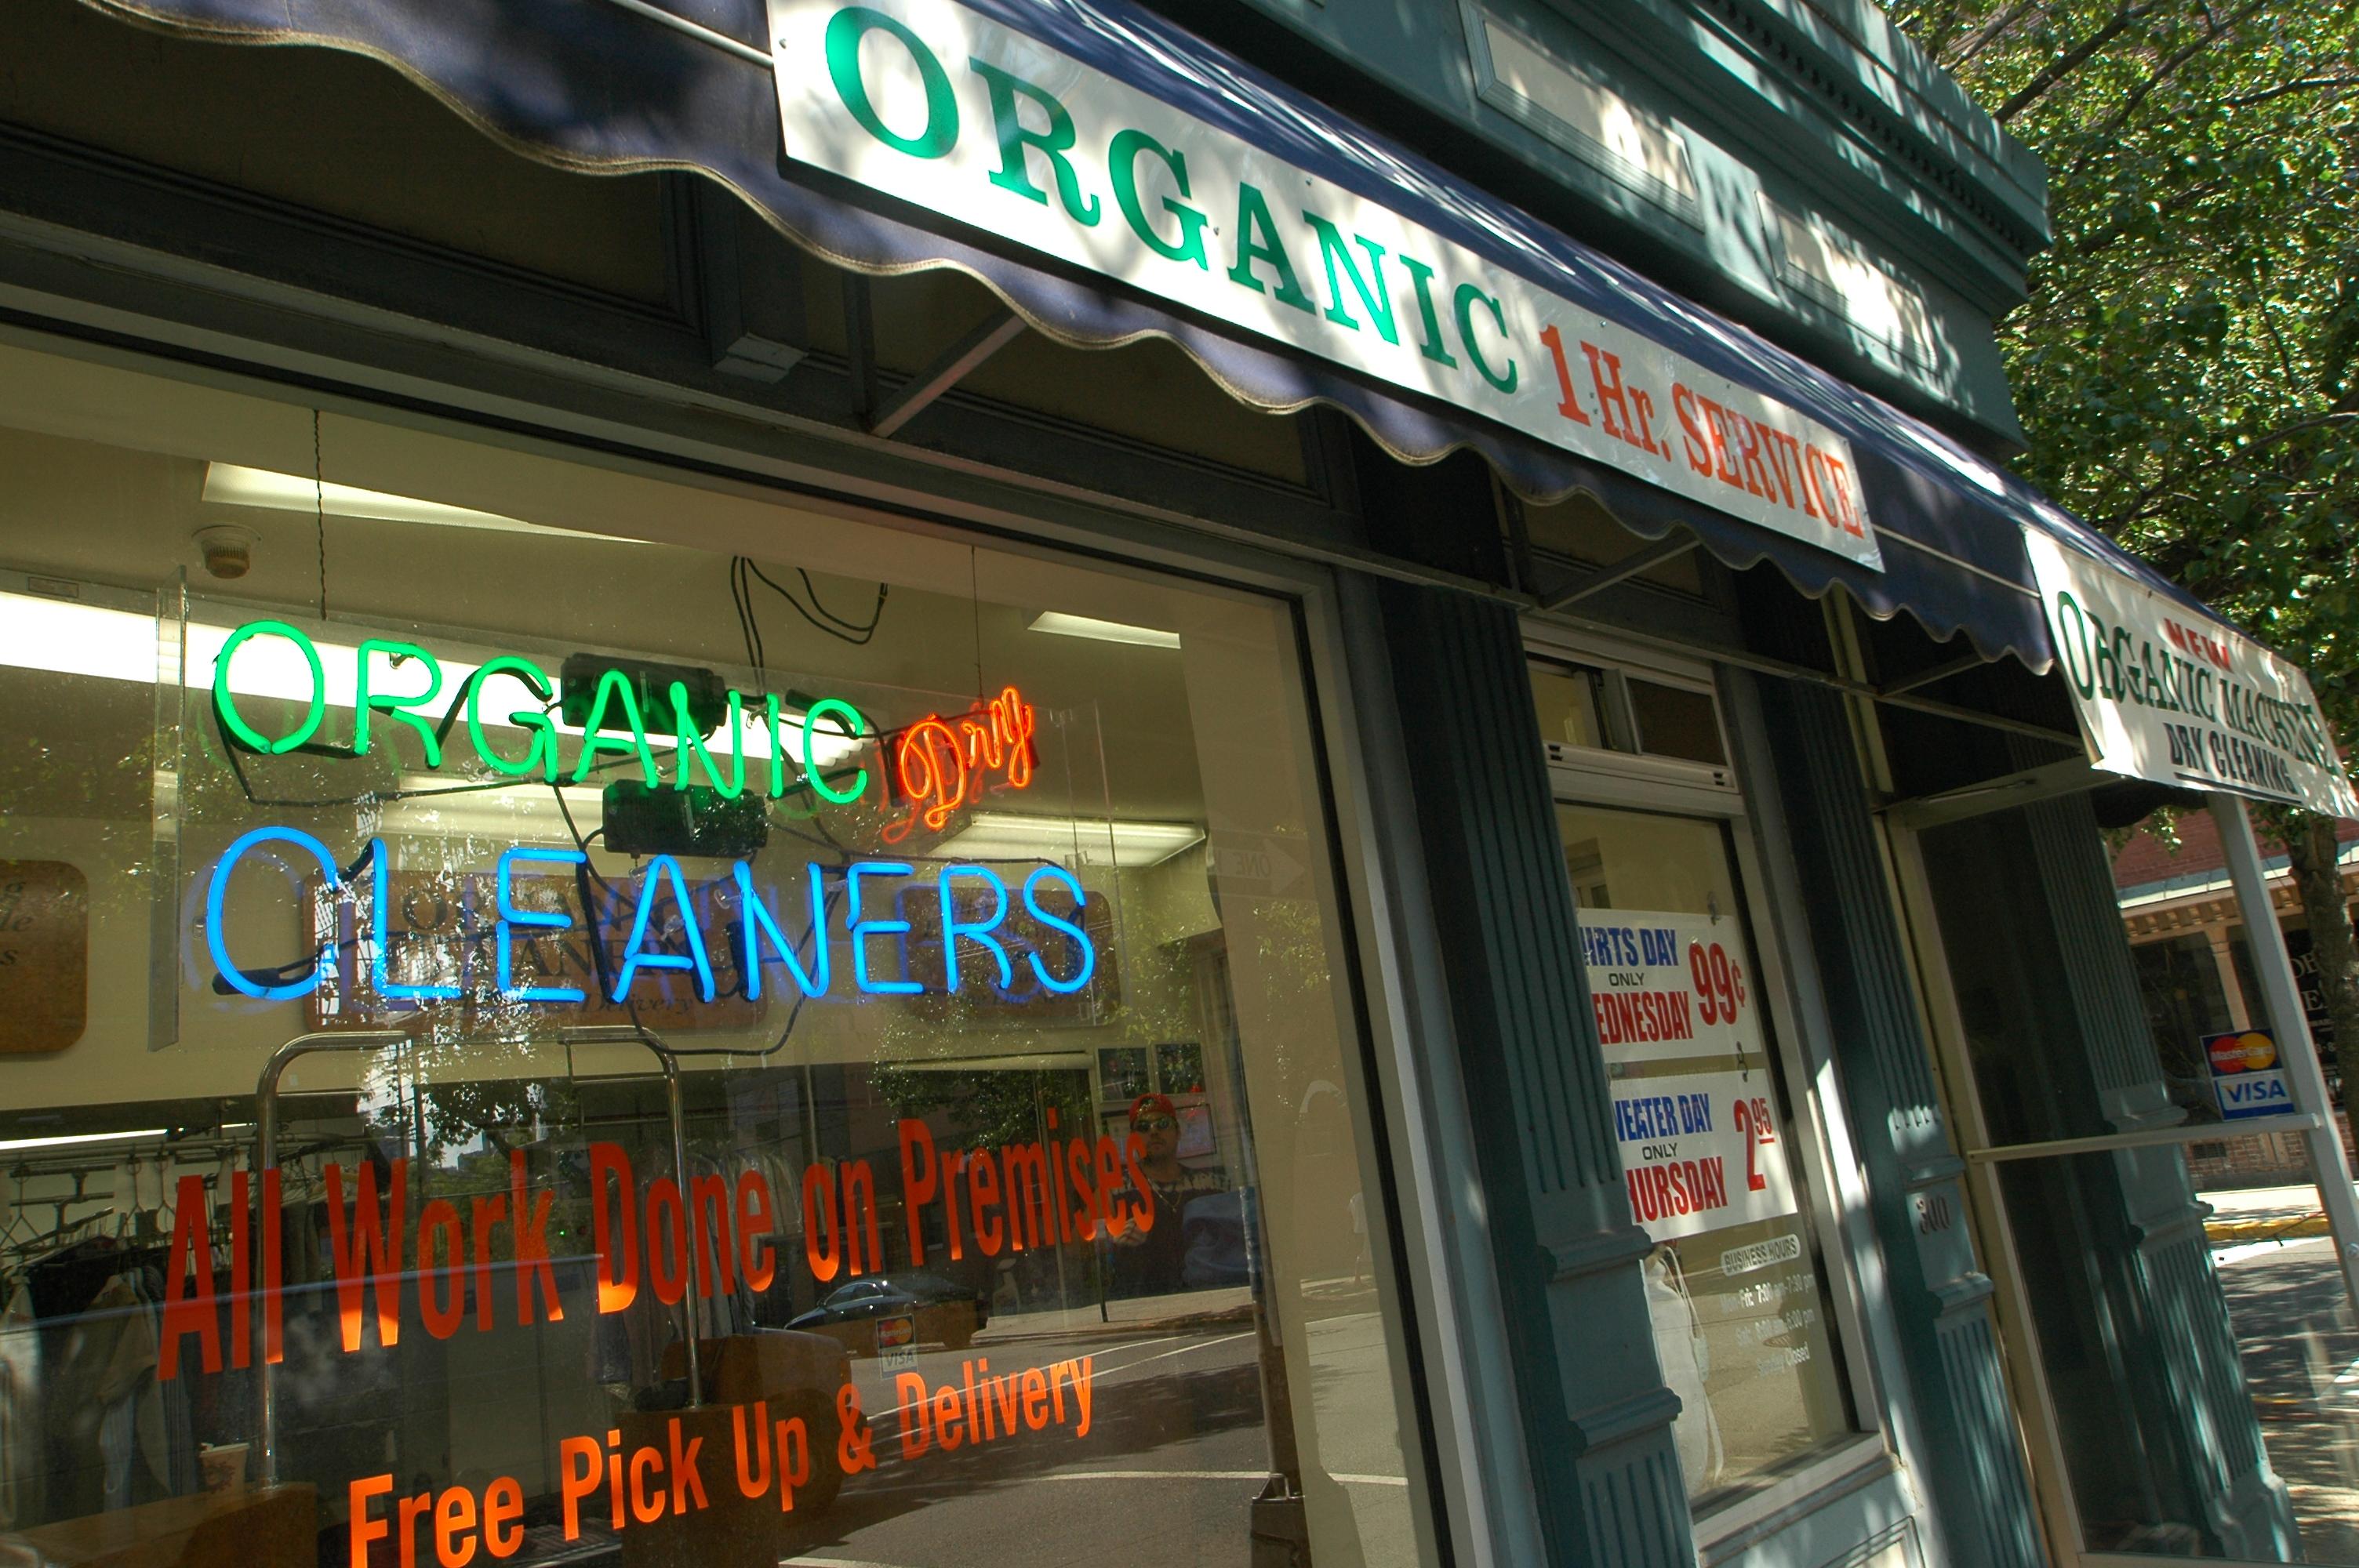 1st Street Organic Cleaner